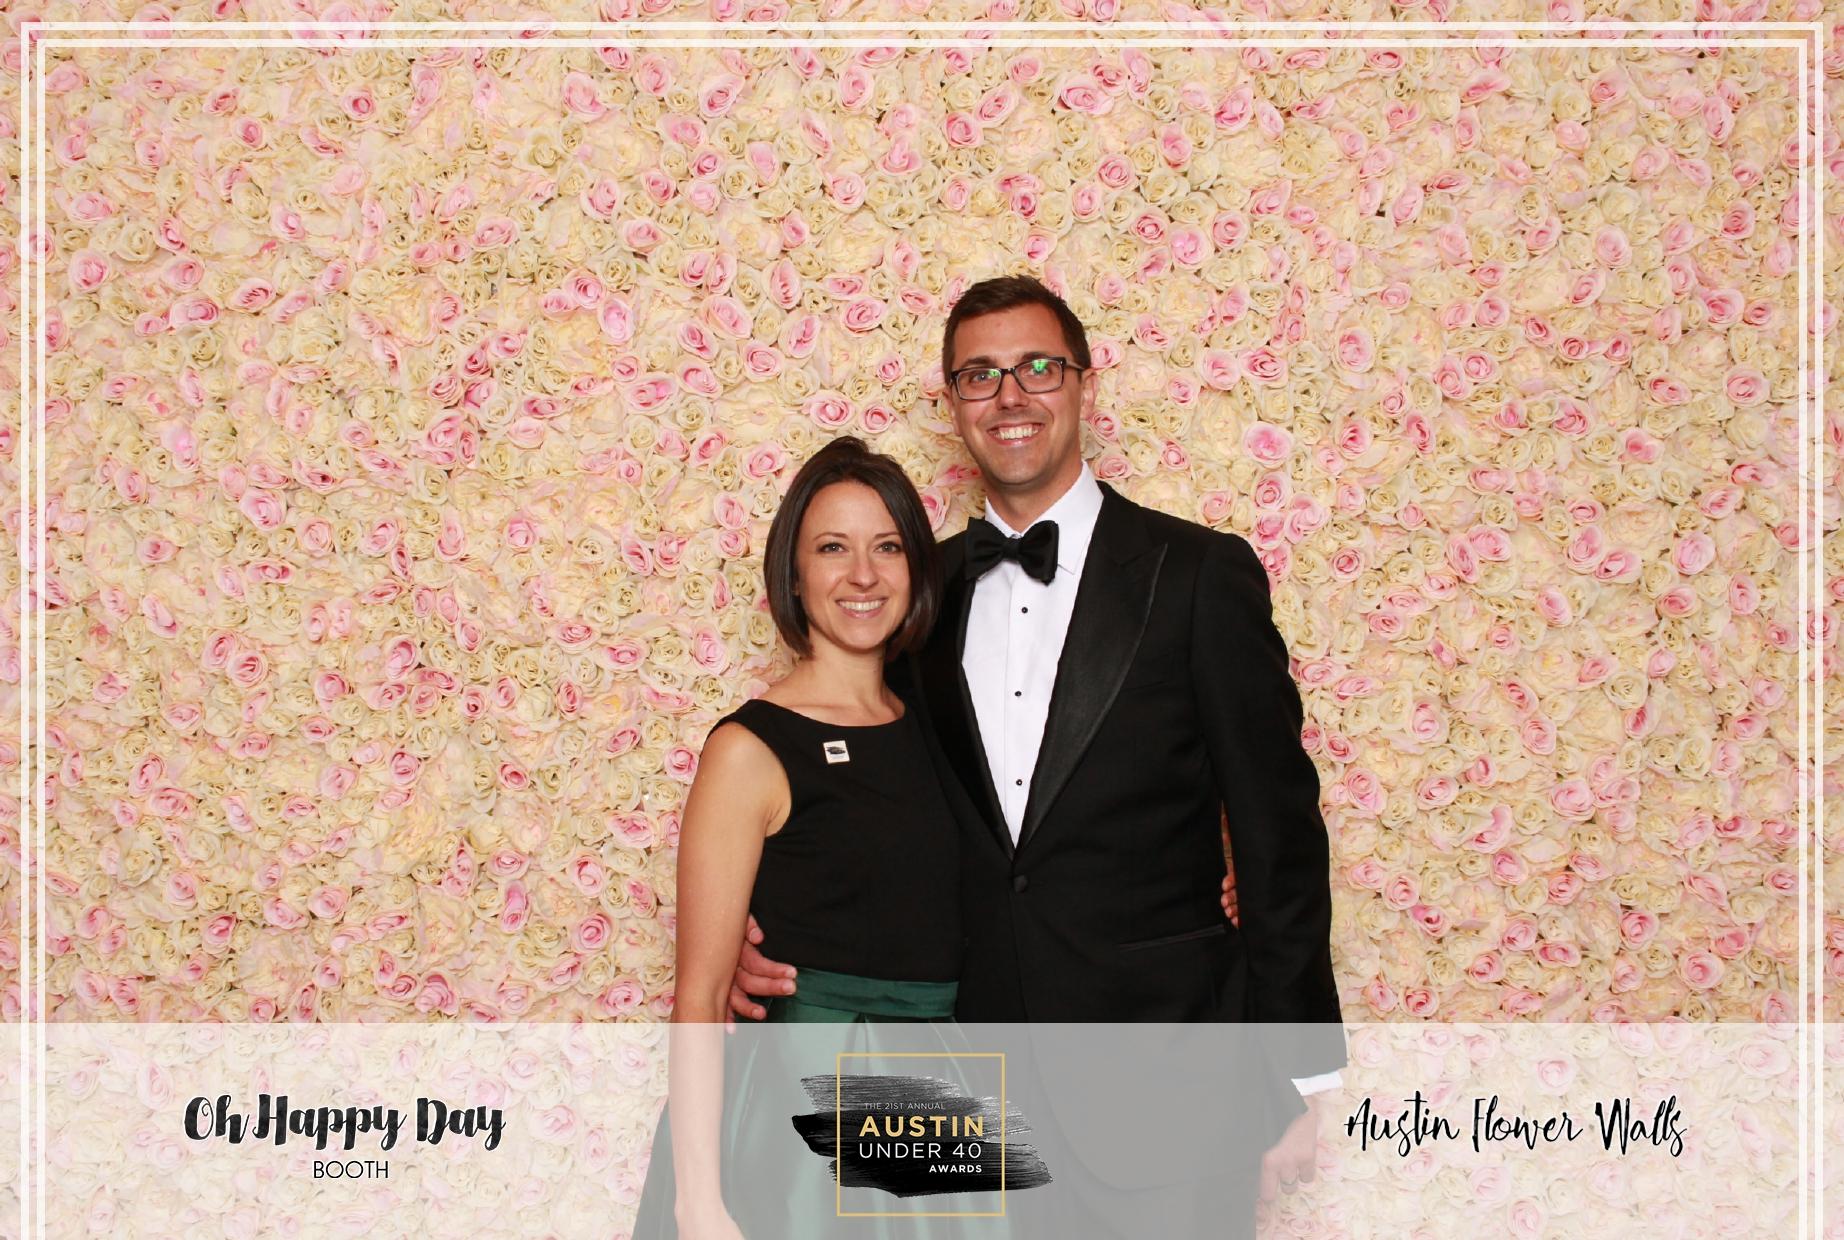 Oh Happy Day Booth - Austin Under 40-107.jpg